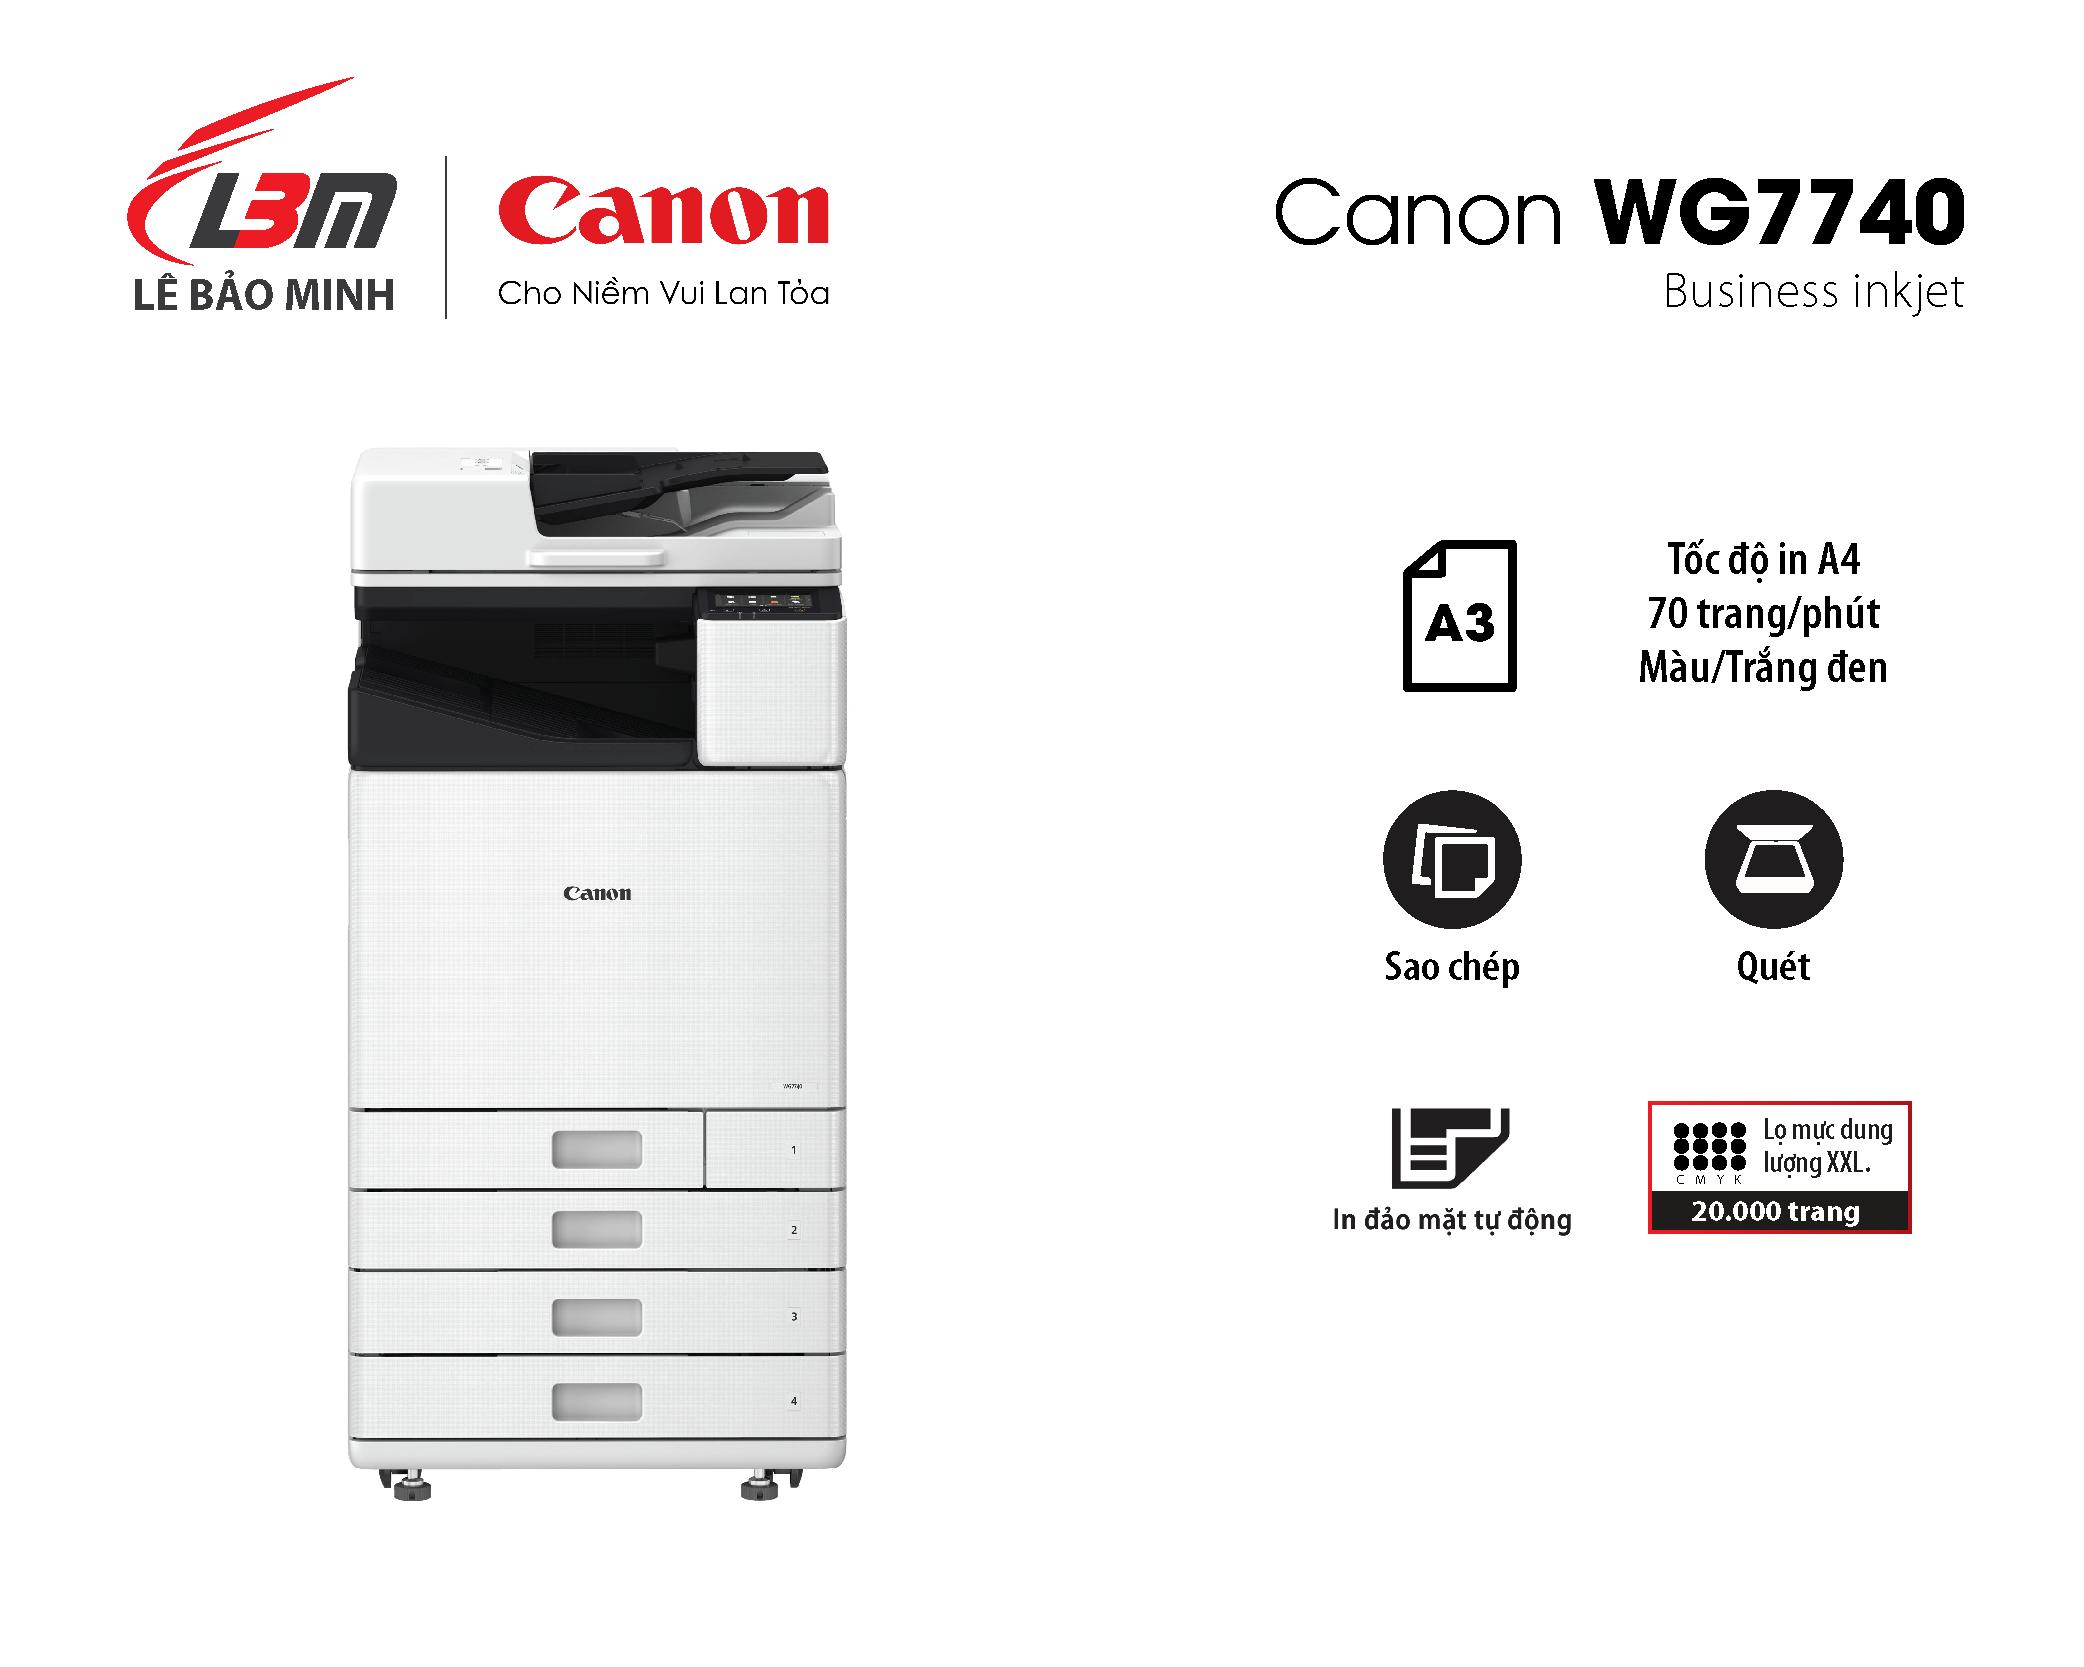 Máy in Phun Canon WG7740 đa năng